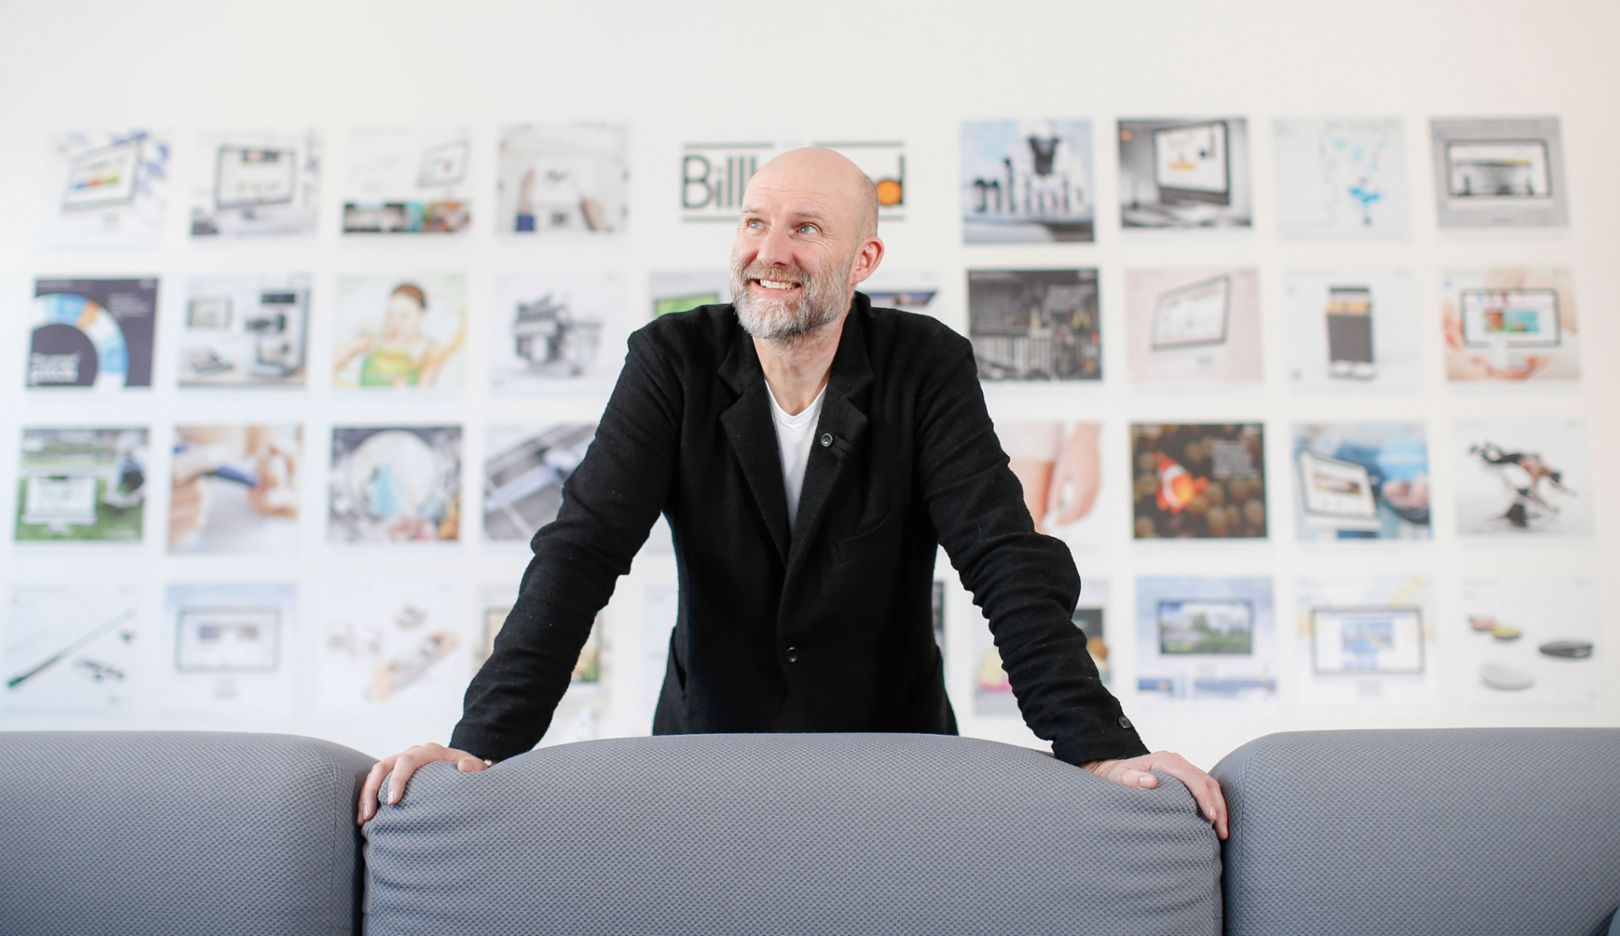 Professor Dr. Johann Füller, Chef der HYVE AG, München, 2017, Porsche Consulting GmbH